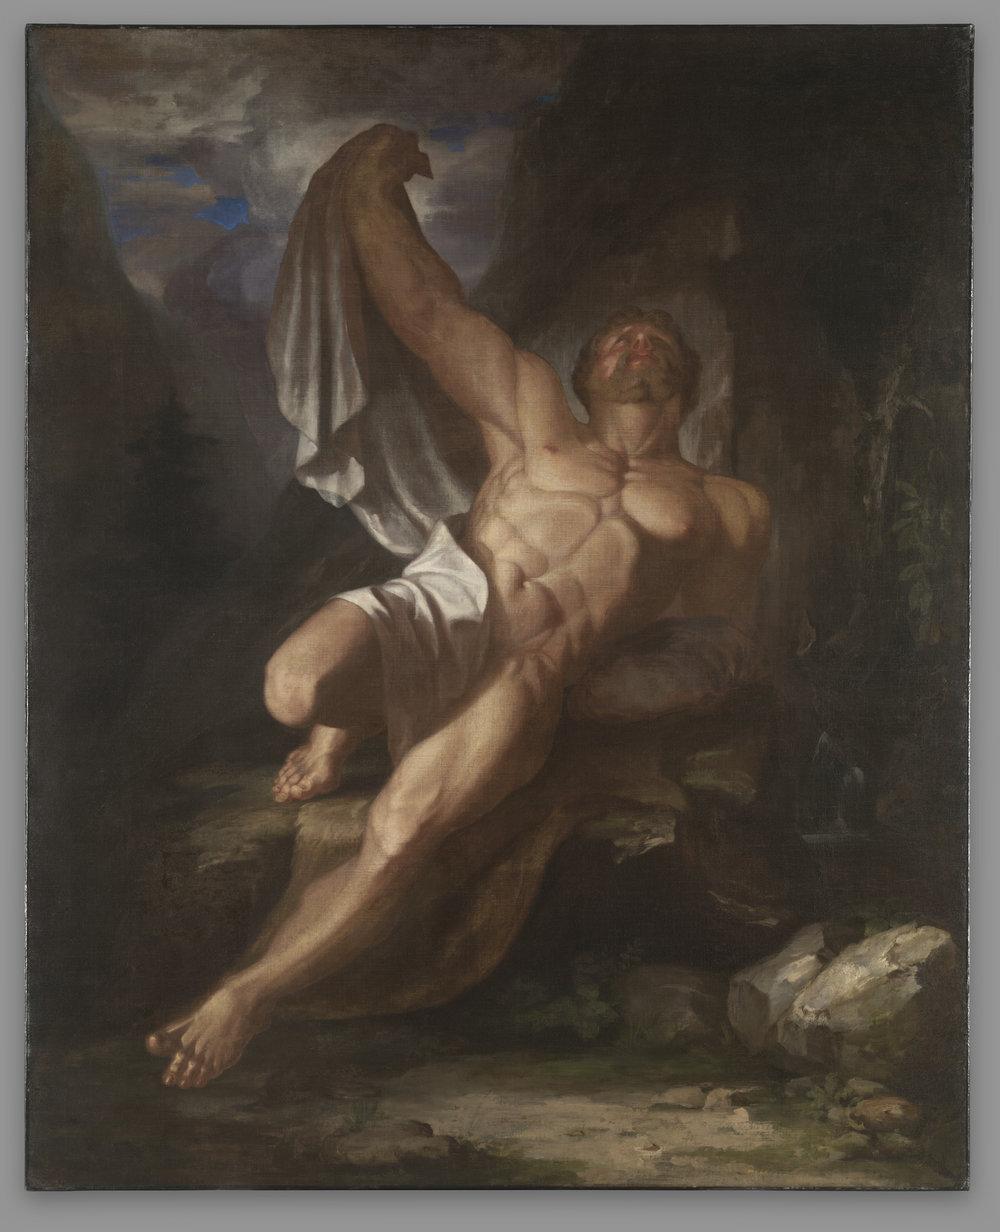 Dying Hercules by Samuel Morse, 1812